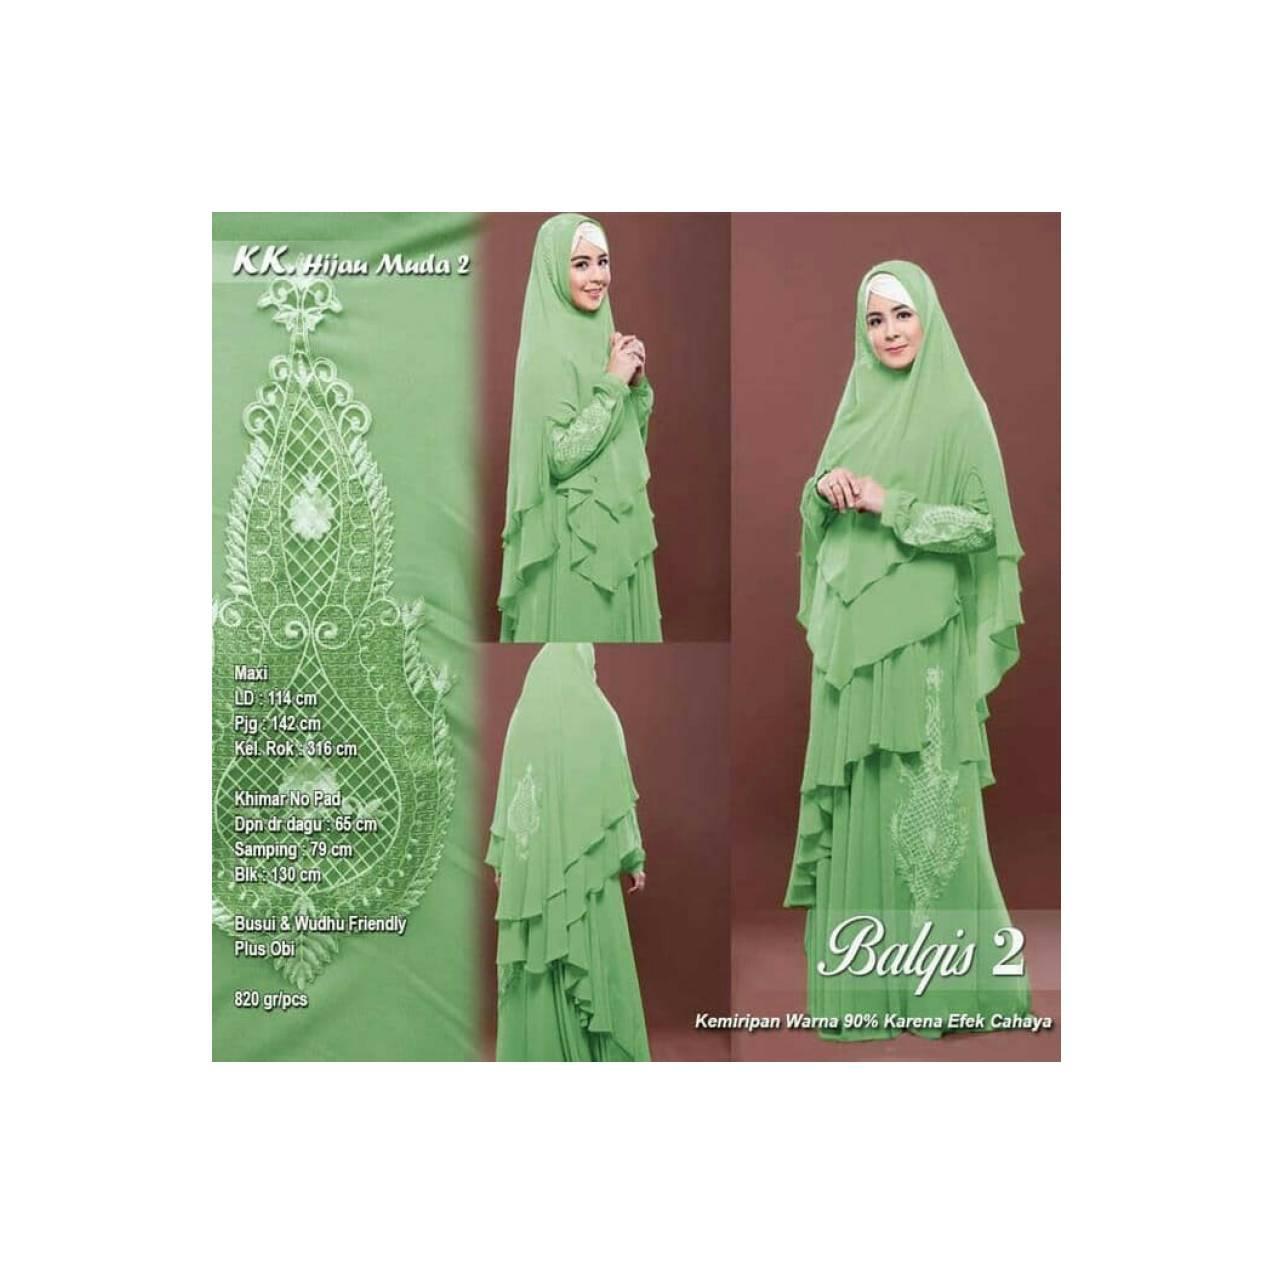 Promo GAMIS/DRESS JUMBO SYARI BORDIR BALQIS HIJAU MUDA Termurah 1.2959